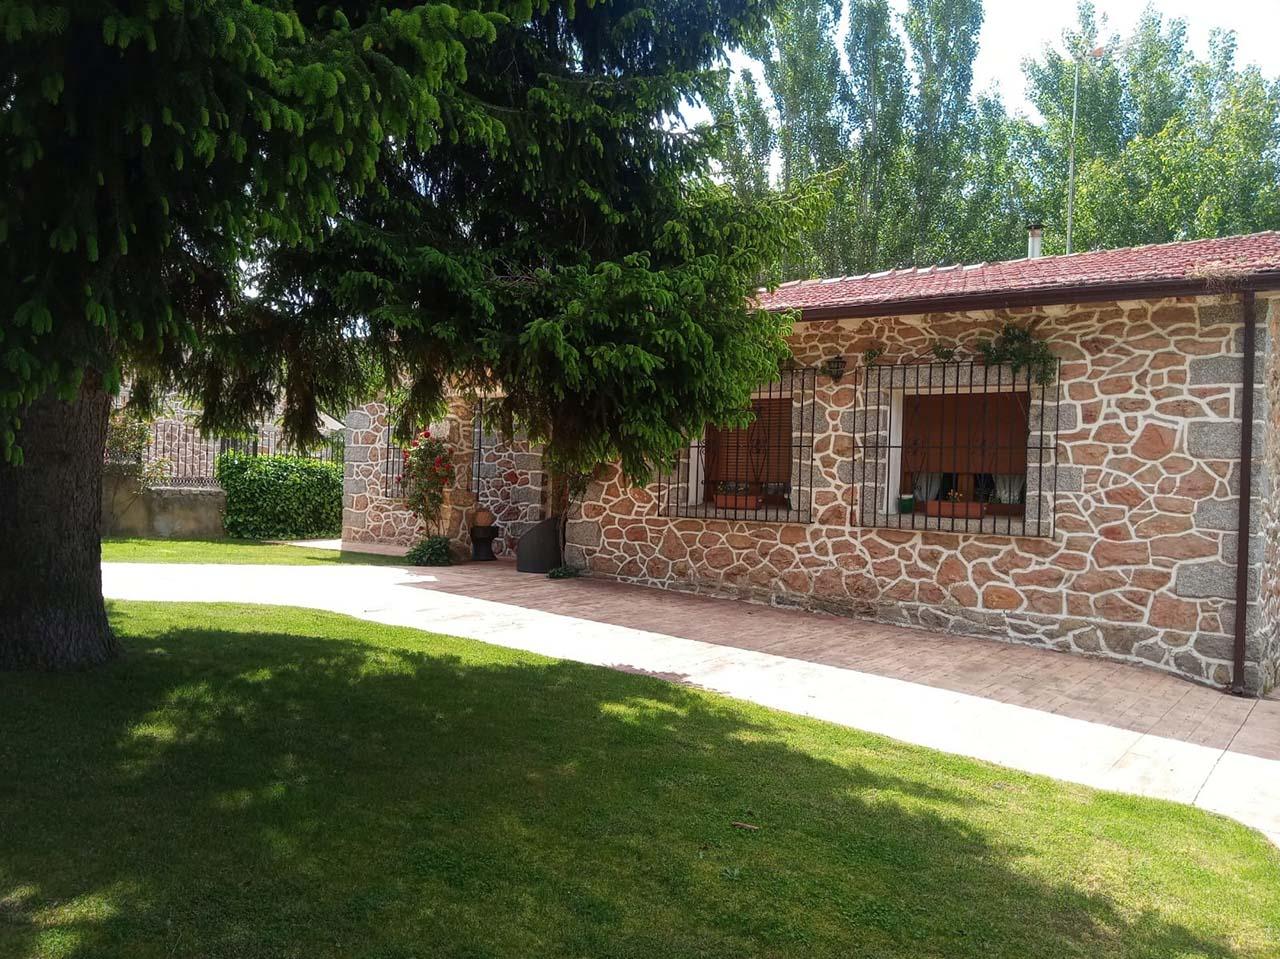 Alquiler de Casa La Tata en Otero de los Herreros, Segovia